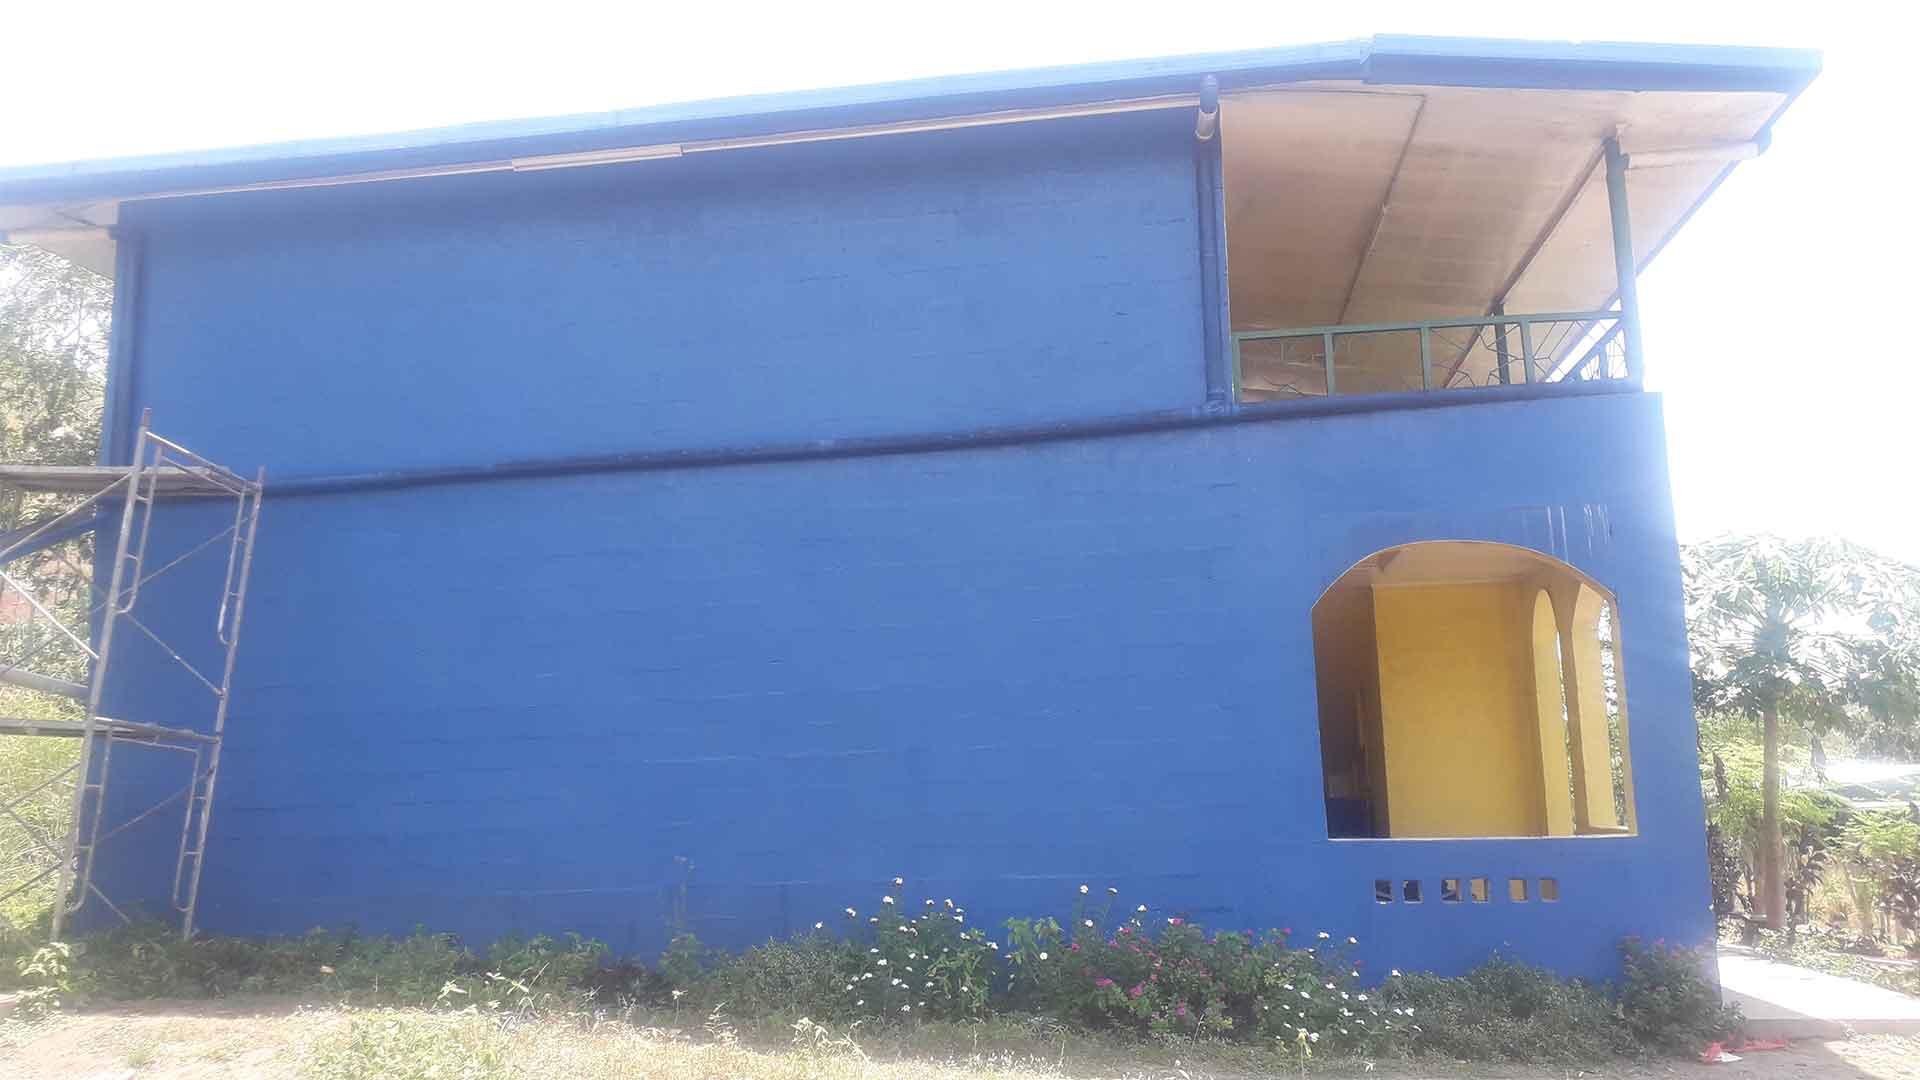 building under construction by Wapco Builders - Taurama